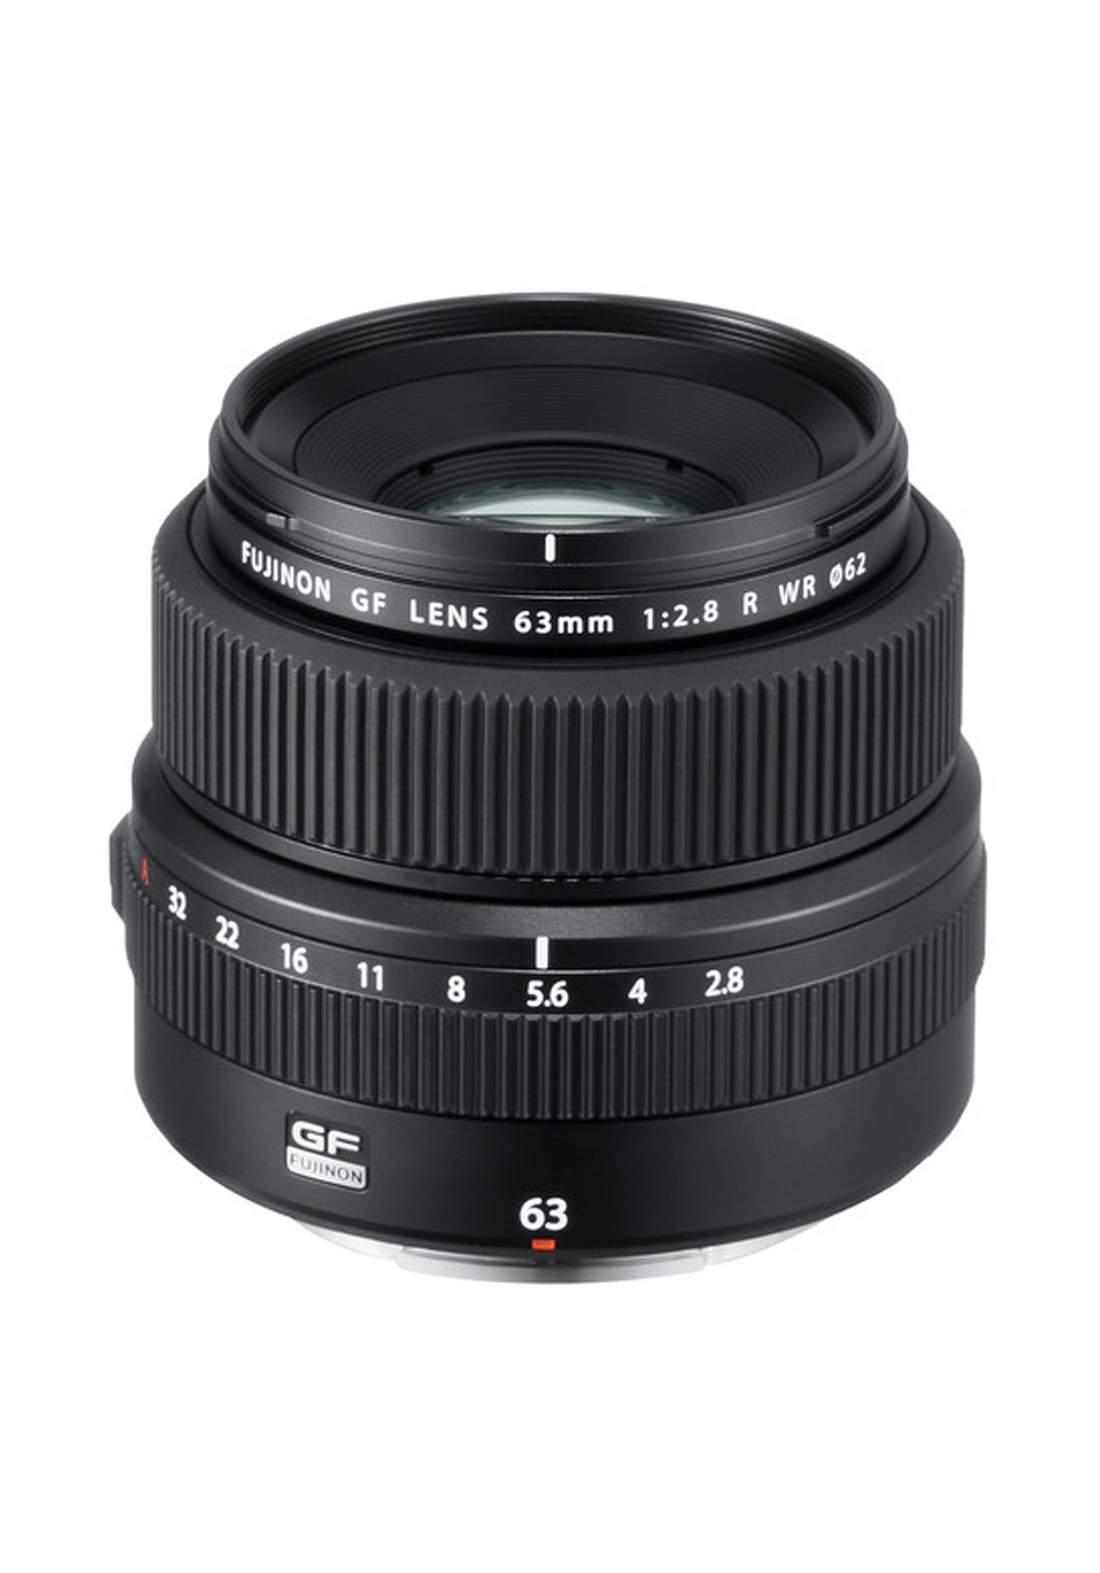 Fujifilm GF 63mm F2.8 R WR Lens - Black عدسة كاميرا